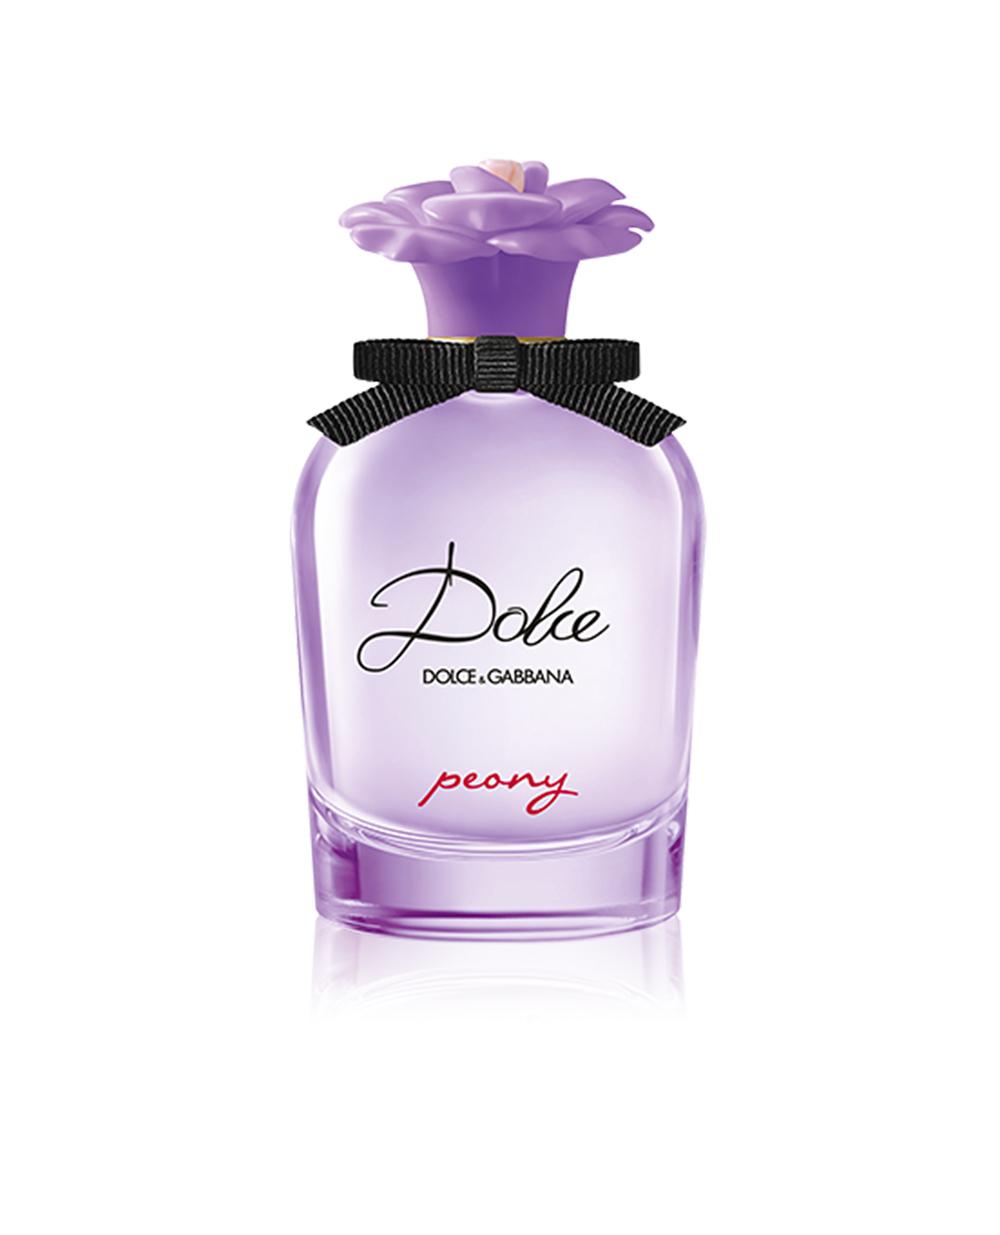 Парфюмированная вода Dolce Peony, 30 мл Dolce&Gabbana 86405500000 ПИОНИ — Kameron